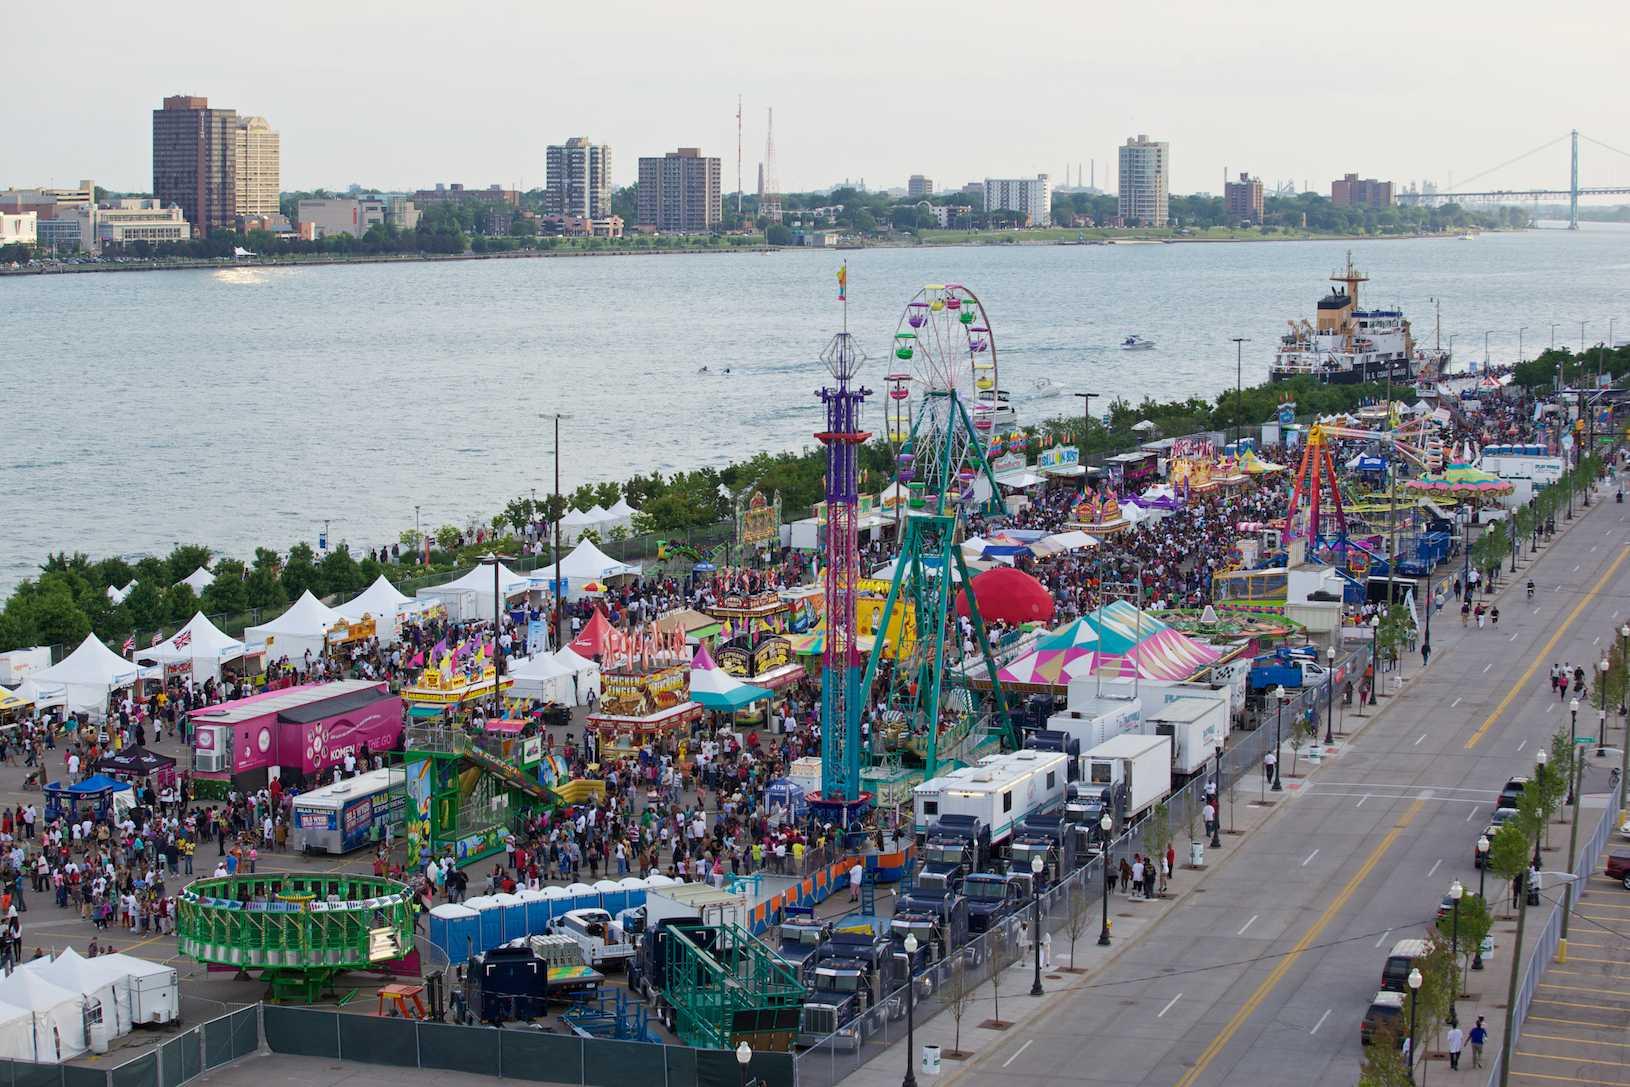 Detroit River Days 2011